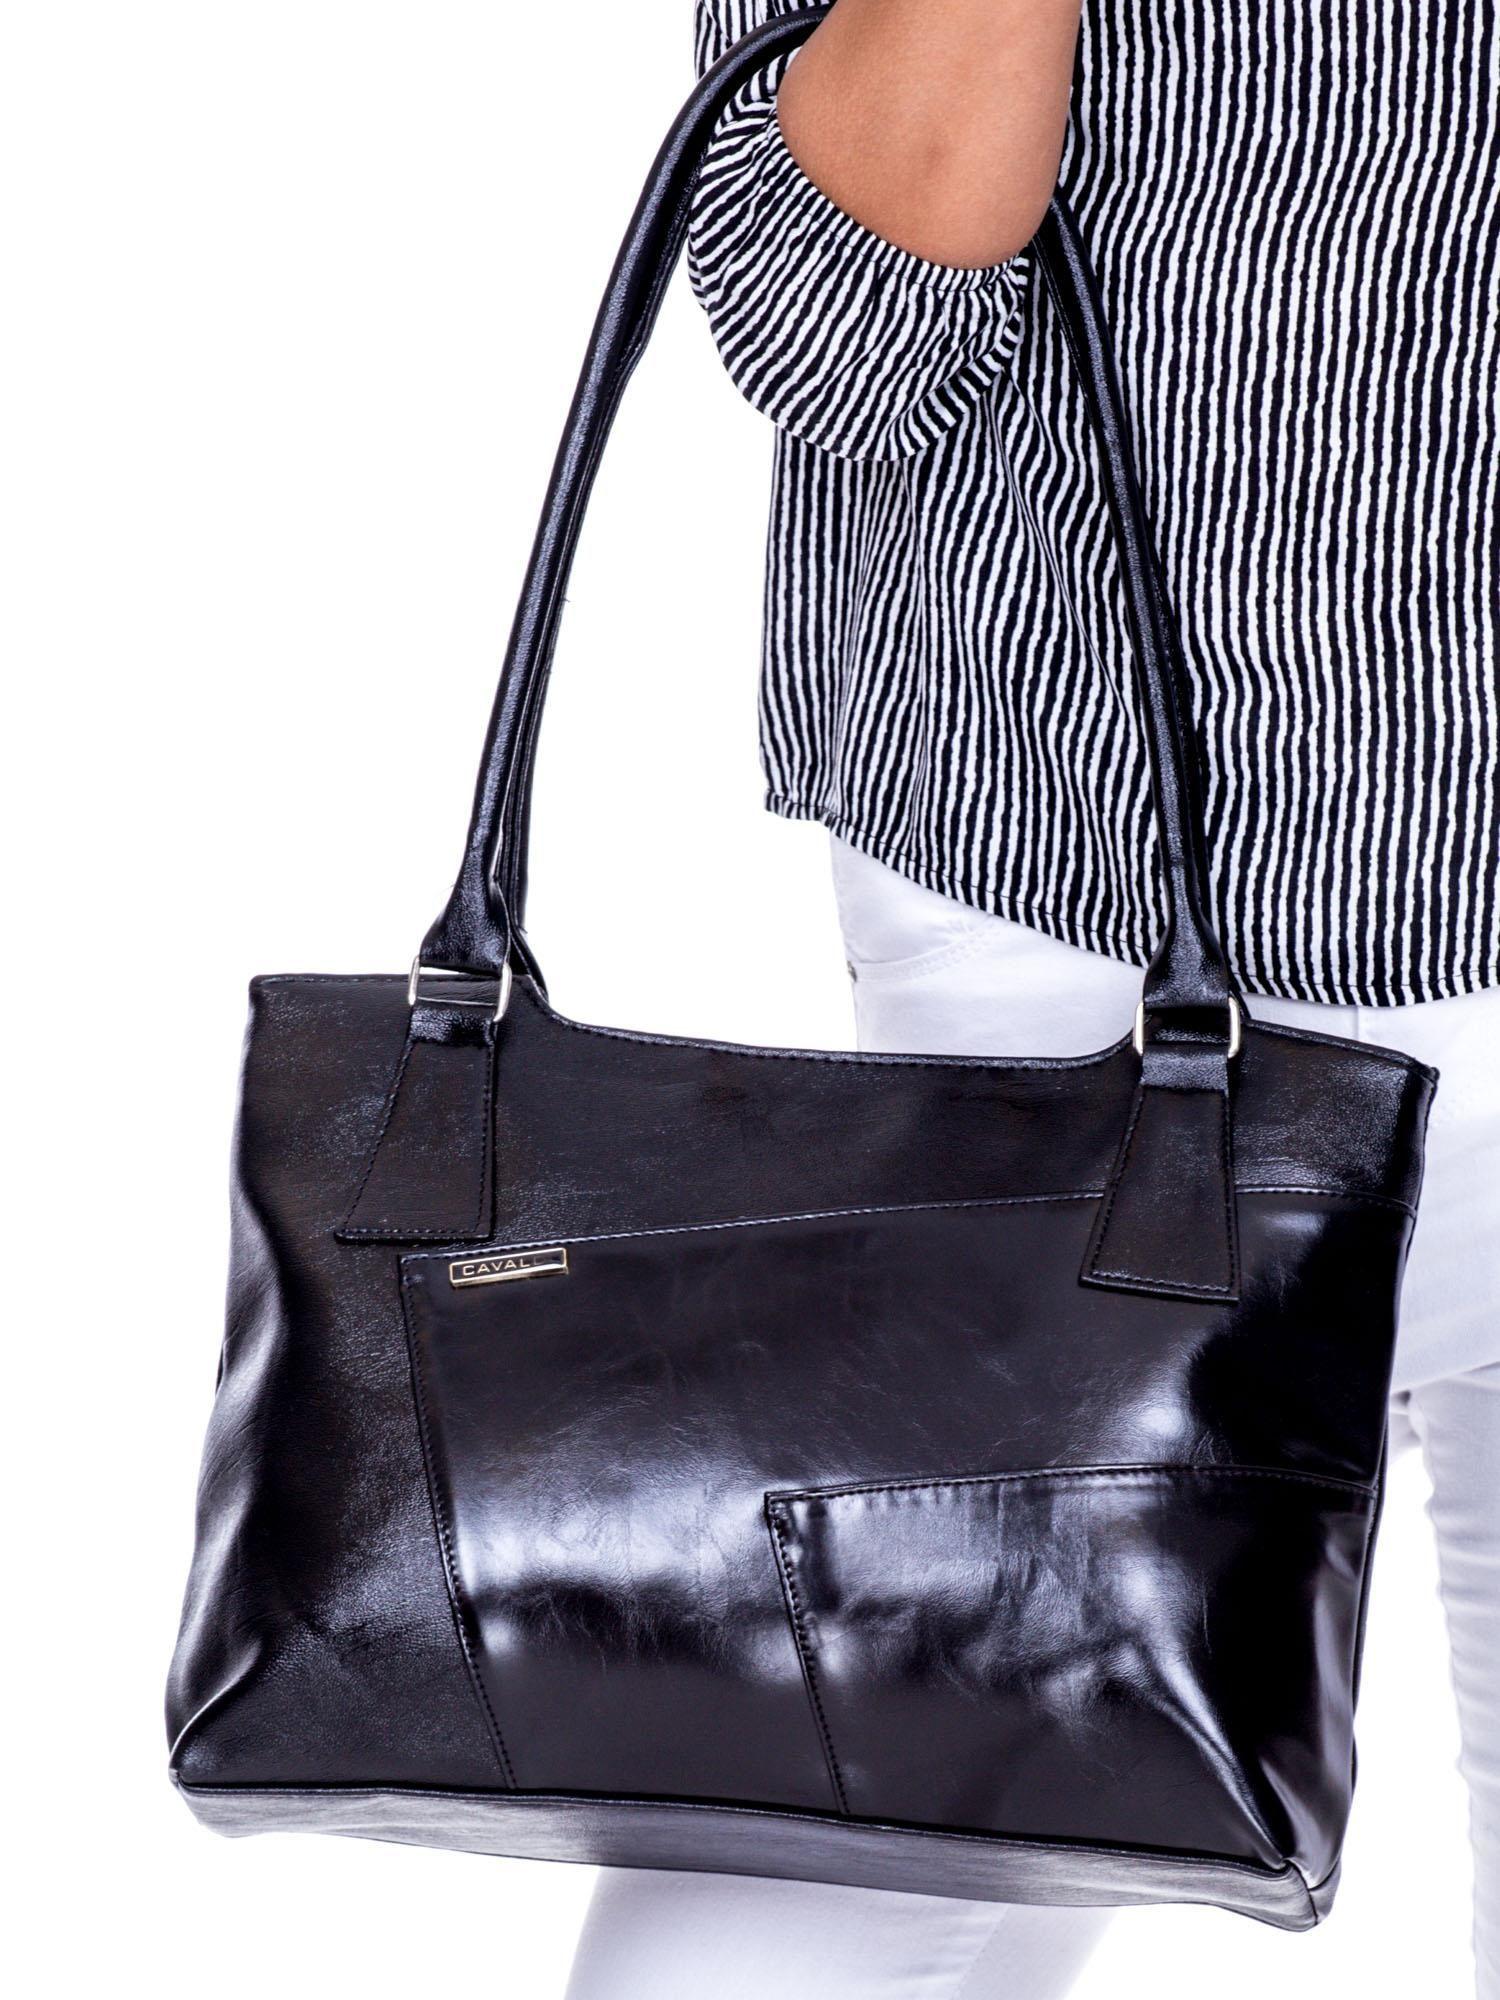 6a5e2fce8dca1 Czarna torebka damska na ramię z przeszyciami - Akcesoria torba ...